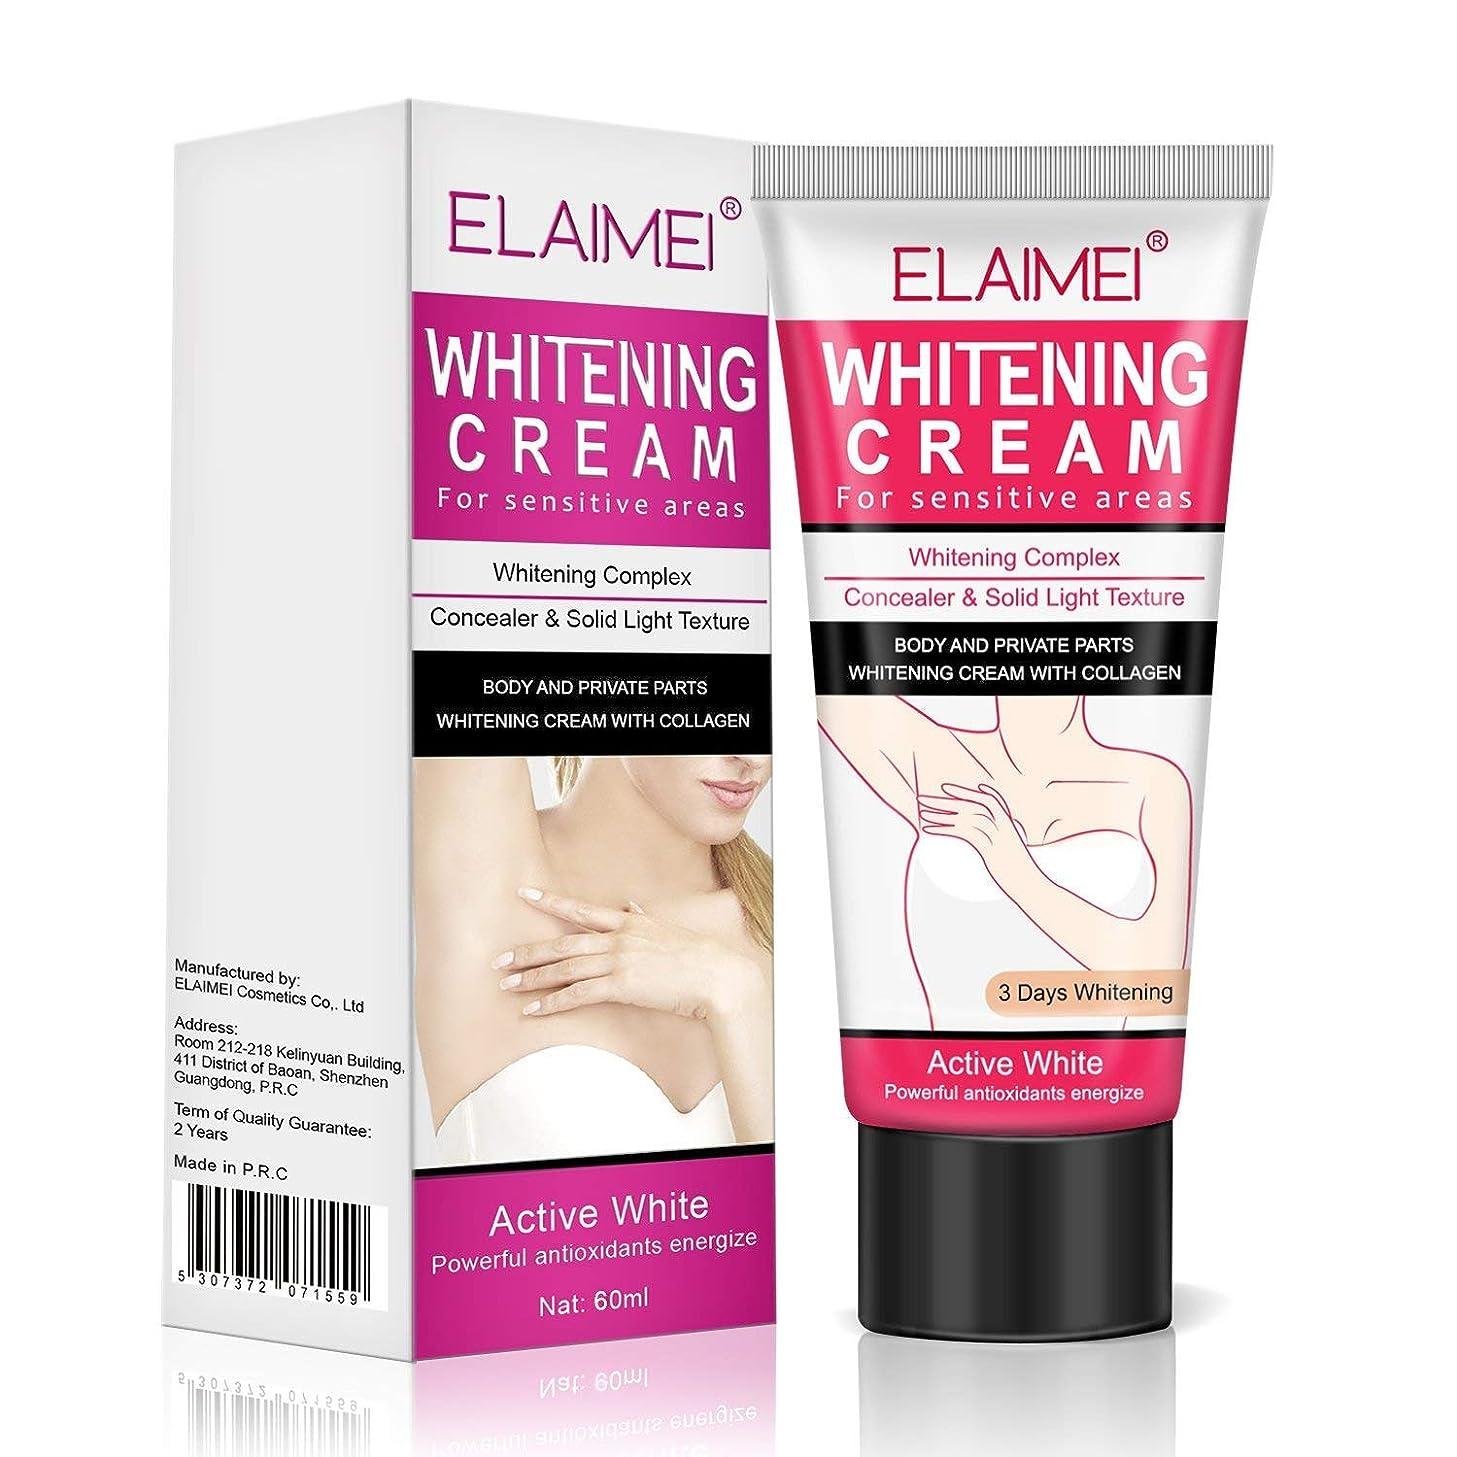 Whitening Cream, Whitening Cream for Sensitive Areas,Skin Whitening Cream, Natural Whitening Deodorant Cream for Dark Skin, Armpit, Elbow, Body, Neck, Underarm Repair Whitening Cream for Women Beauty